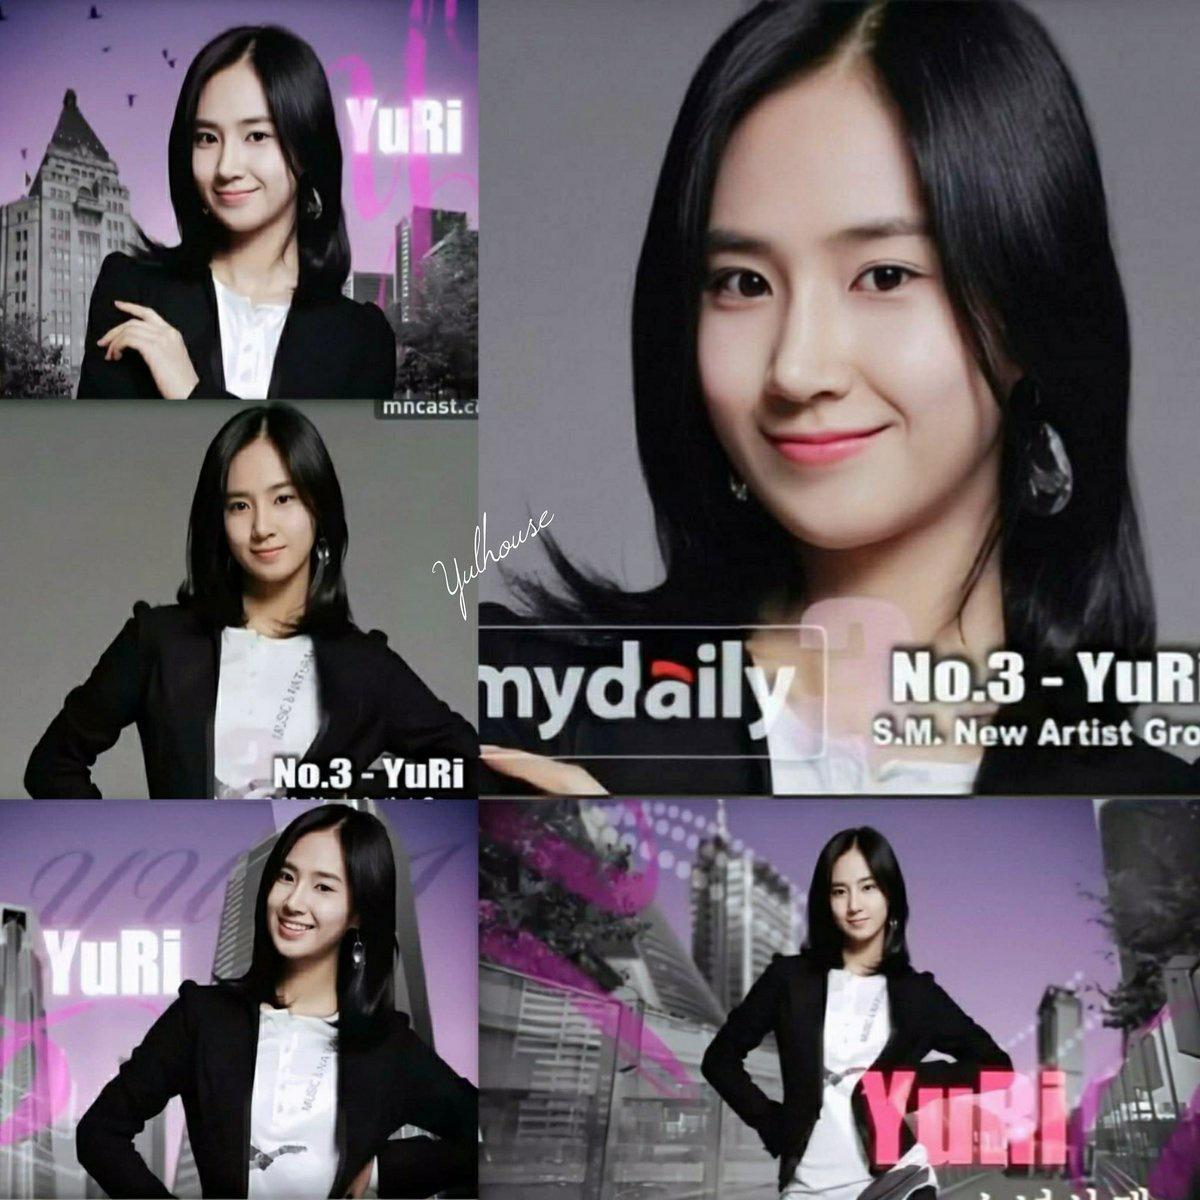 070708 S.M. New Artist Group No.3 - YuRi_2